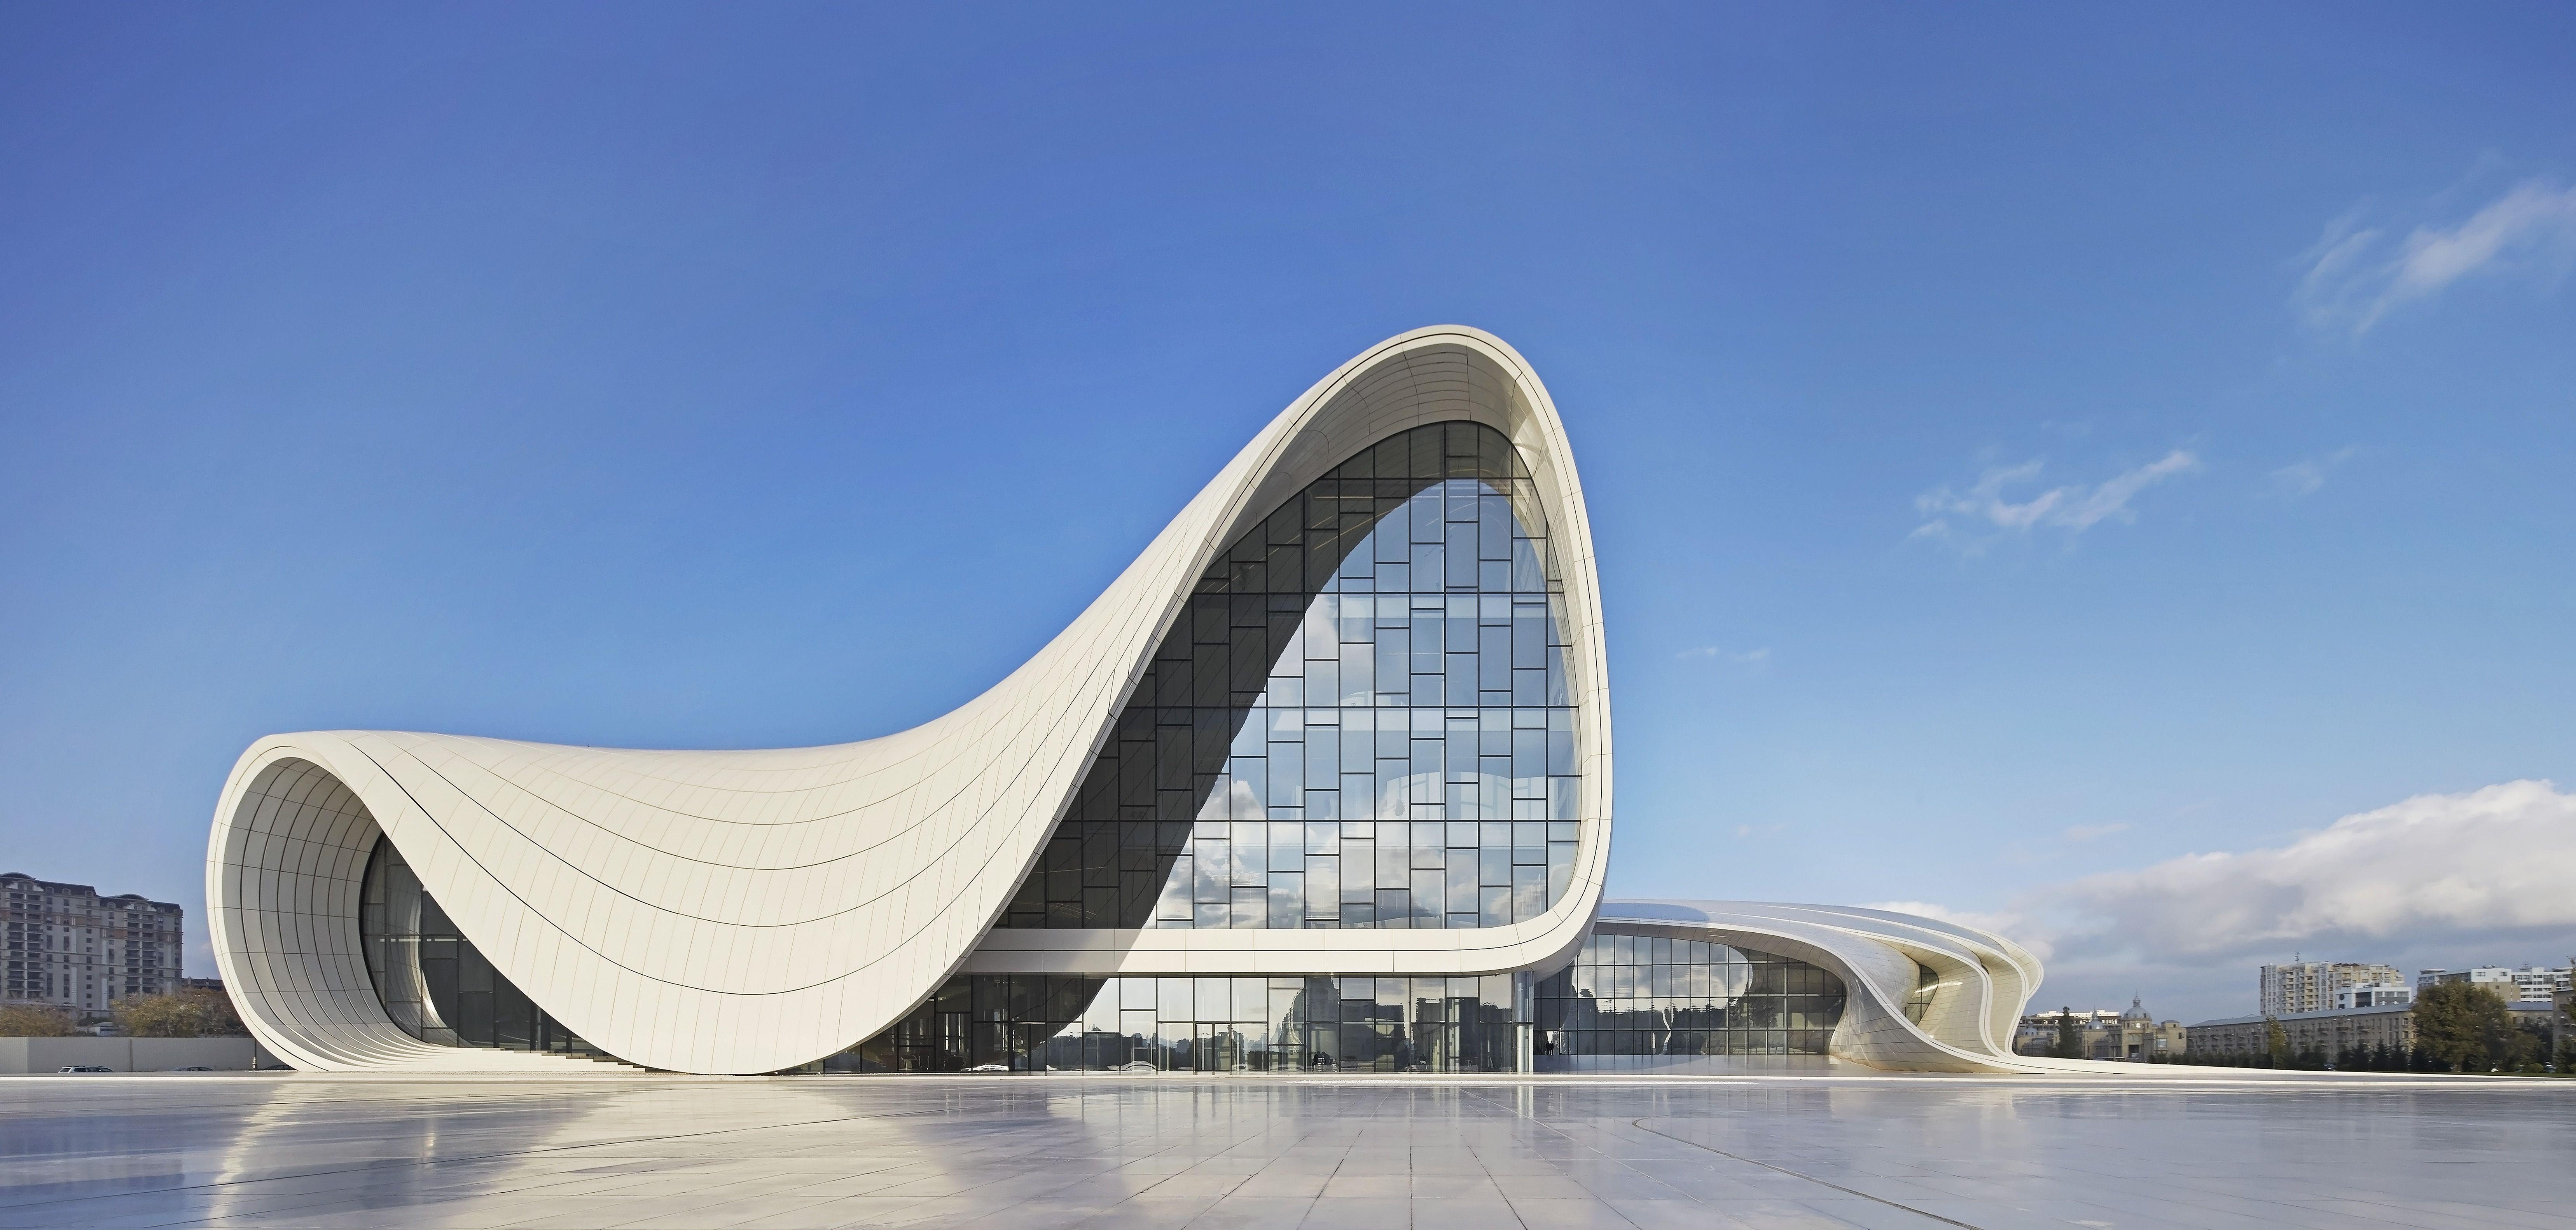 Heydar Alijev Cultural Centre, Baku, Azerbaijan. Architect: Zaha Hadid Architects, 2013